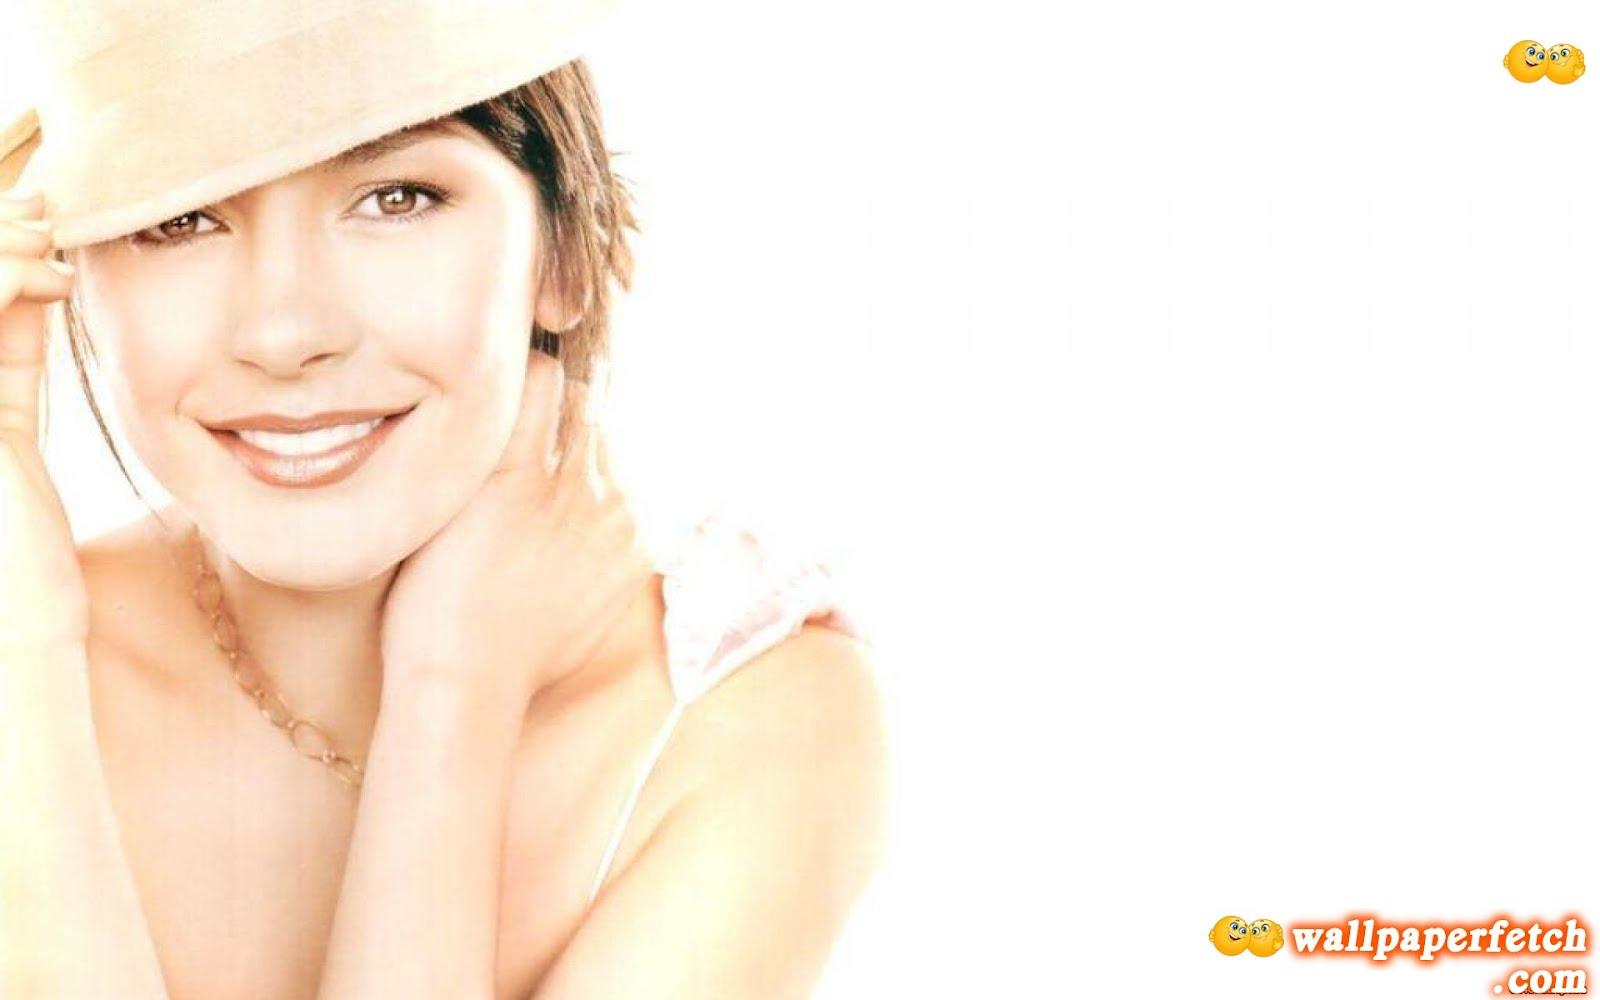 http://2.bp.blogspot.com/-eJLFblbcb7g/T_7kbozvXMI/AAAAAAAAFDA/HsFZY5Xd-gQ/s1600/Catherine-Zeta-Jones-045-1920x1200.jpg